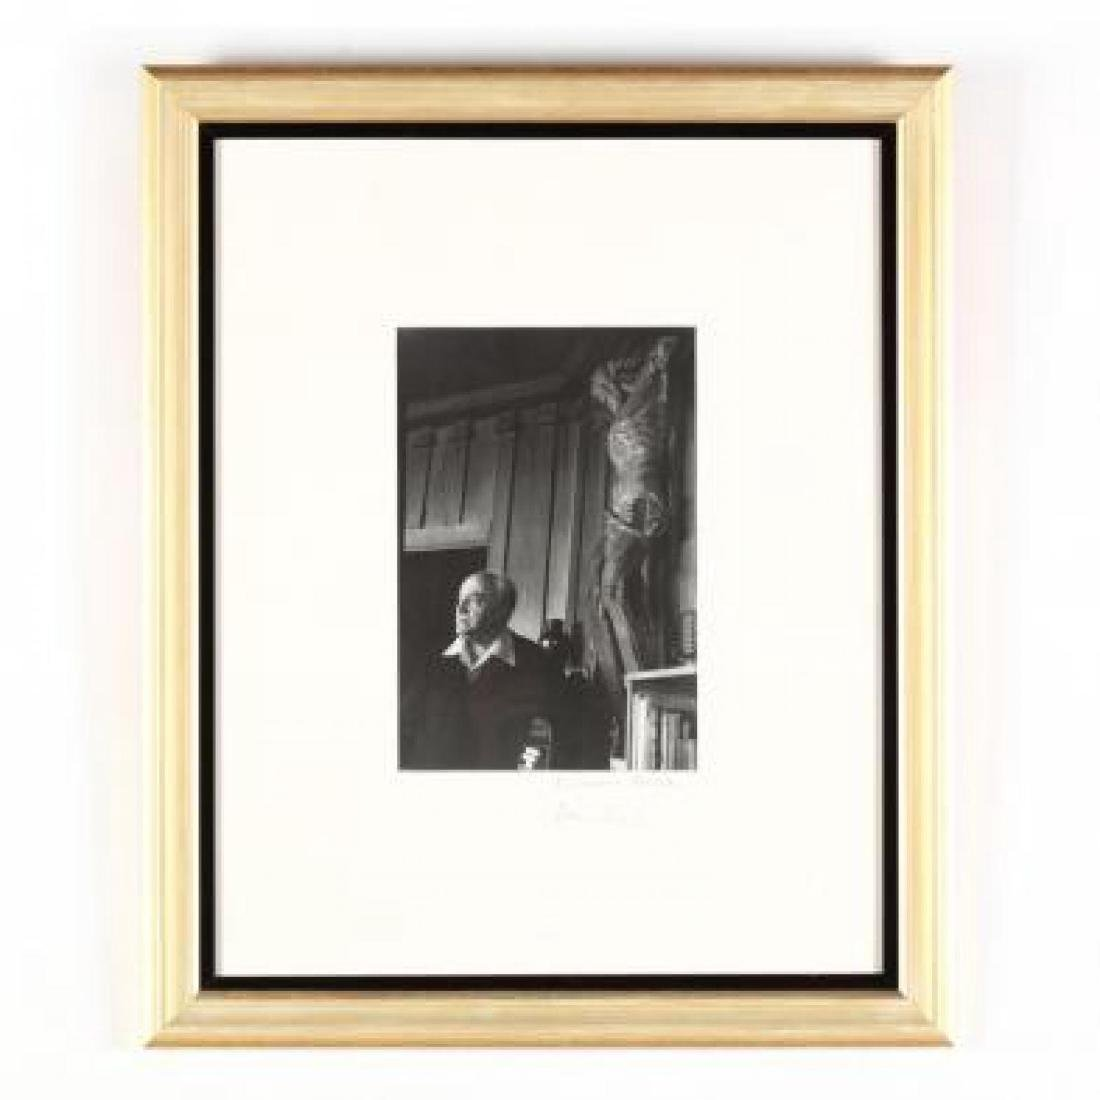 Lucienne Bloch (American, 1909-1999), Portrait of